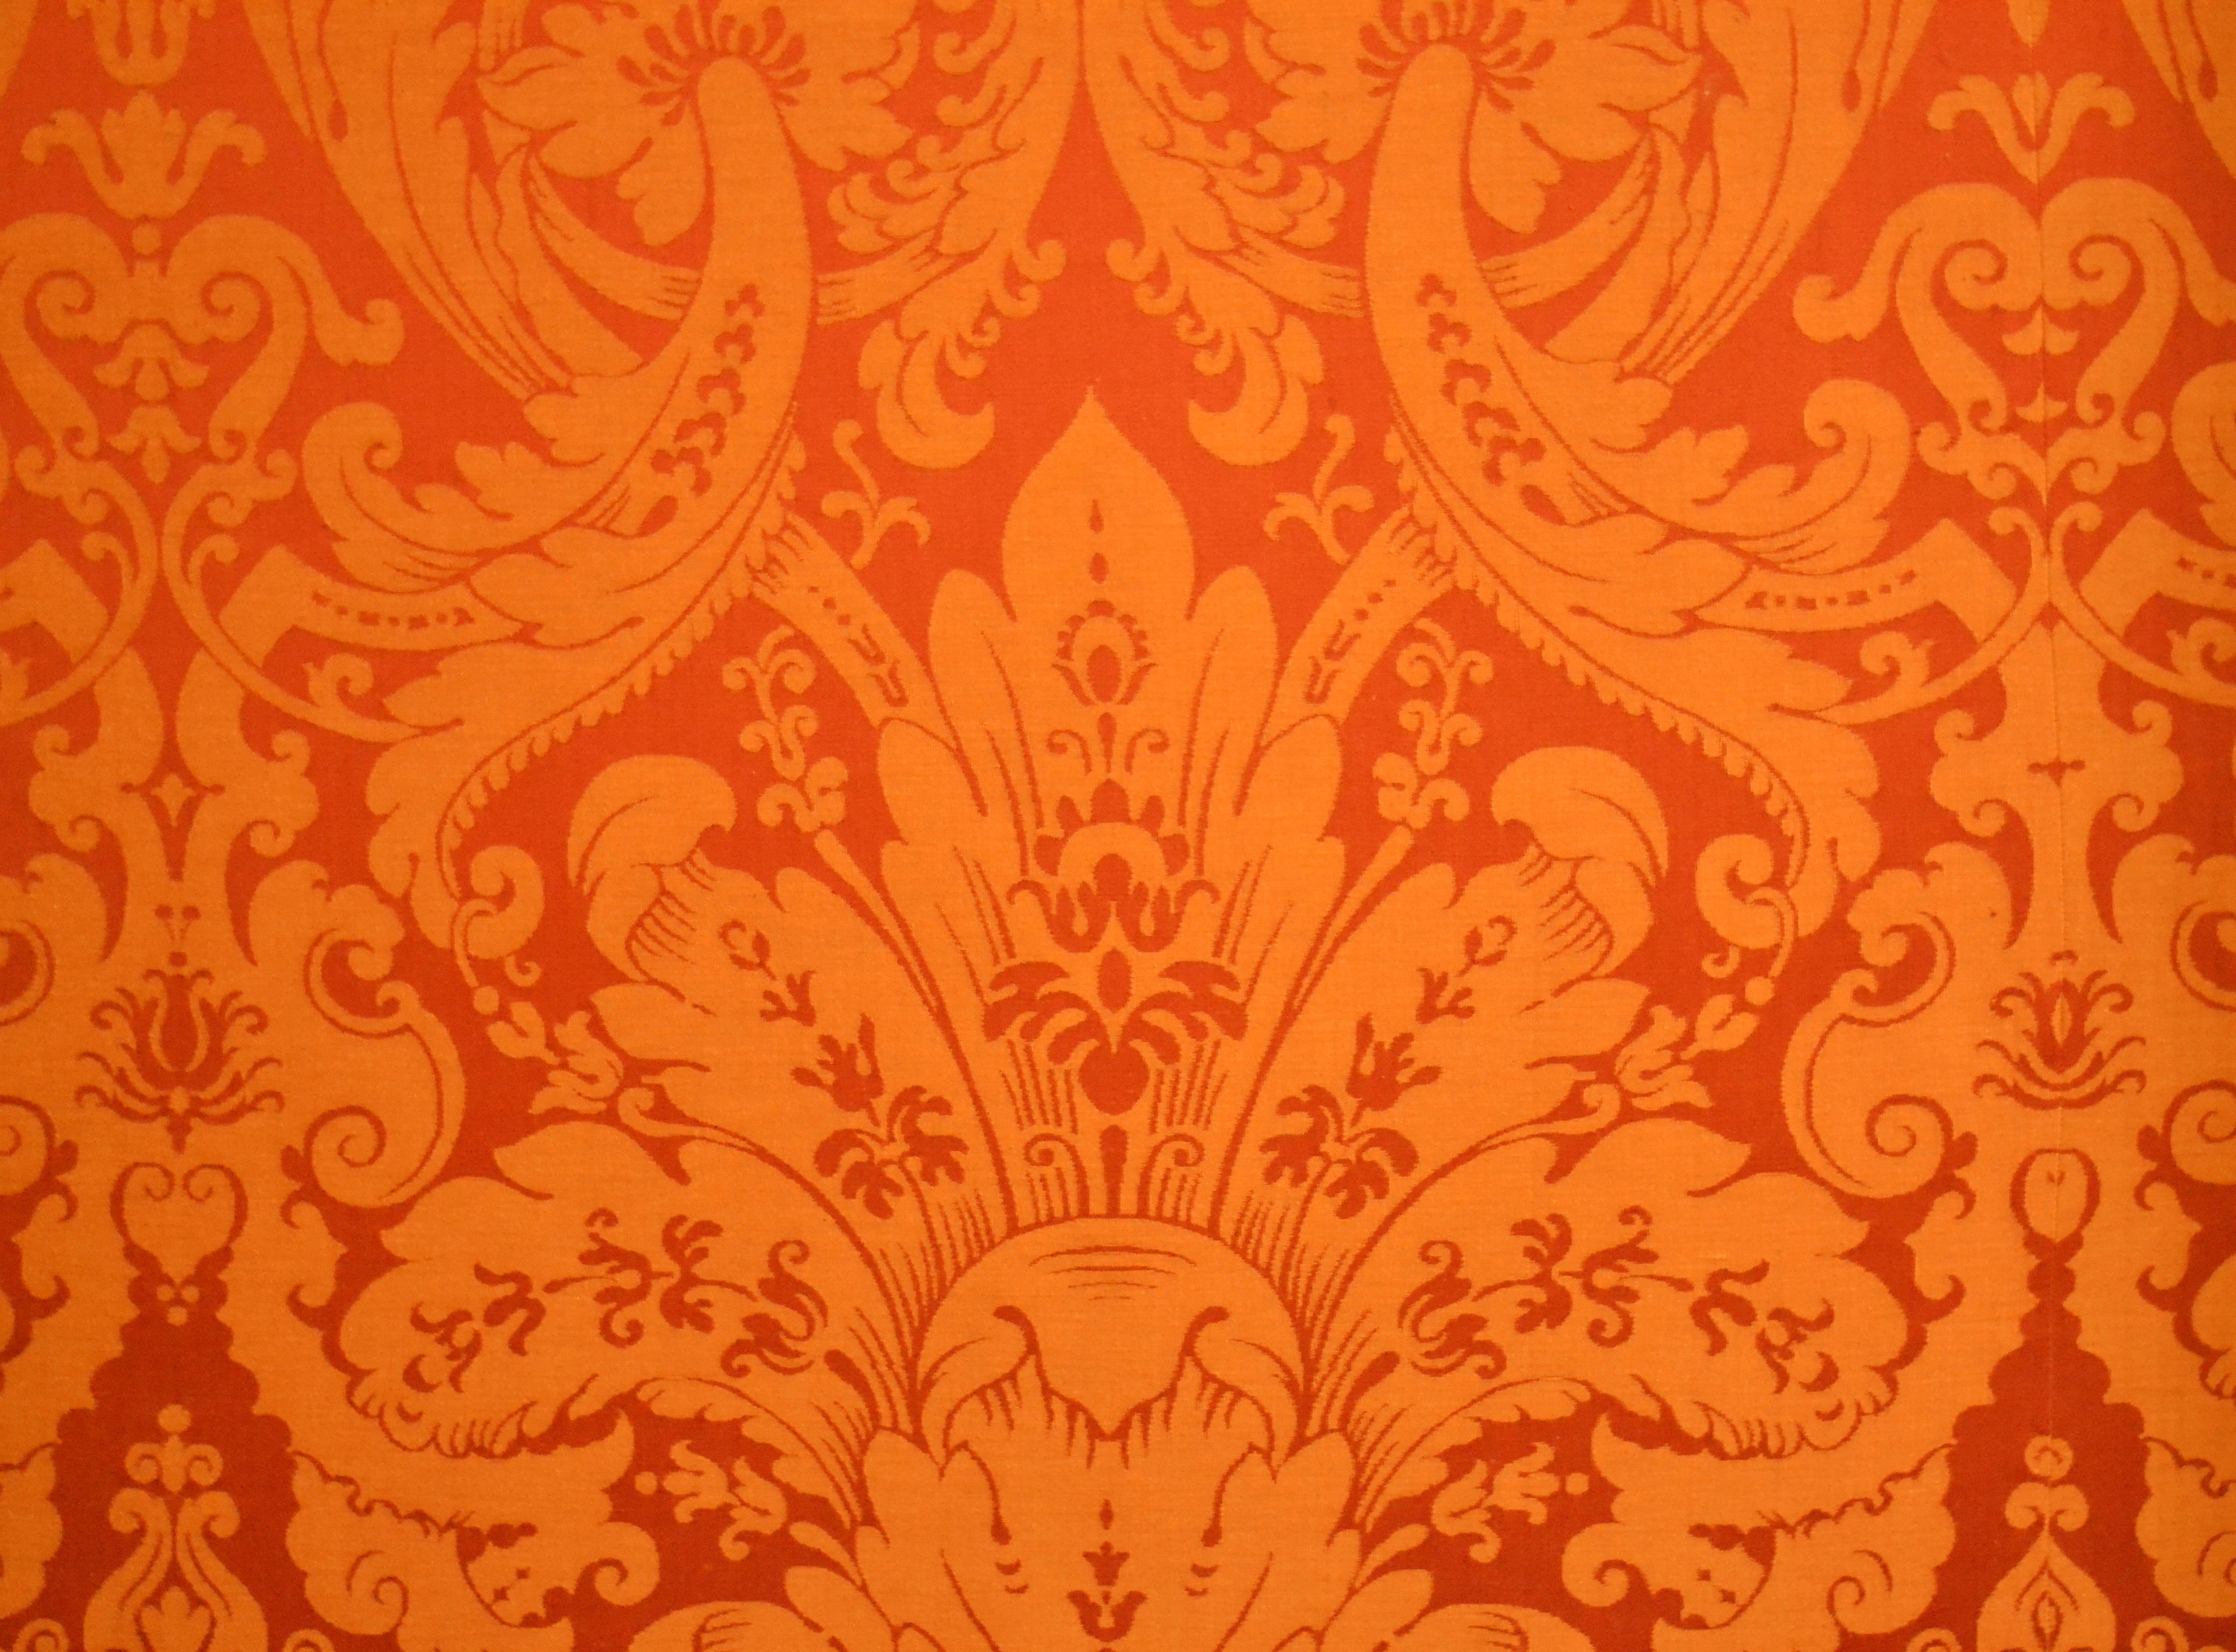 Classic French Baroque Silk Wallpaper at Chteau de Chambord   Loire 4158x3072